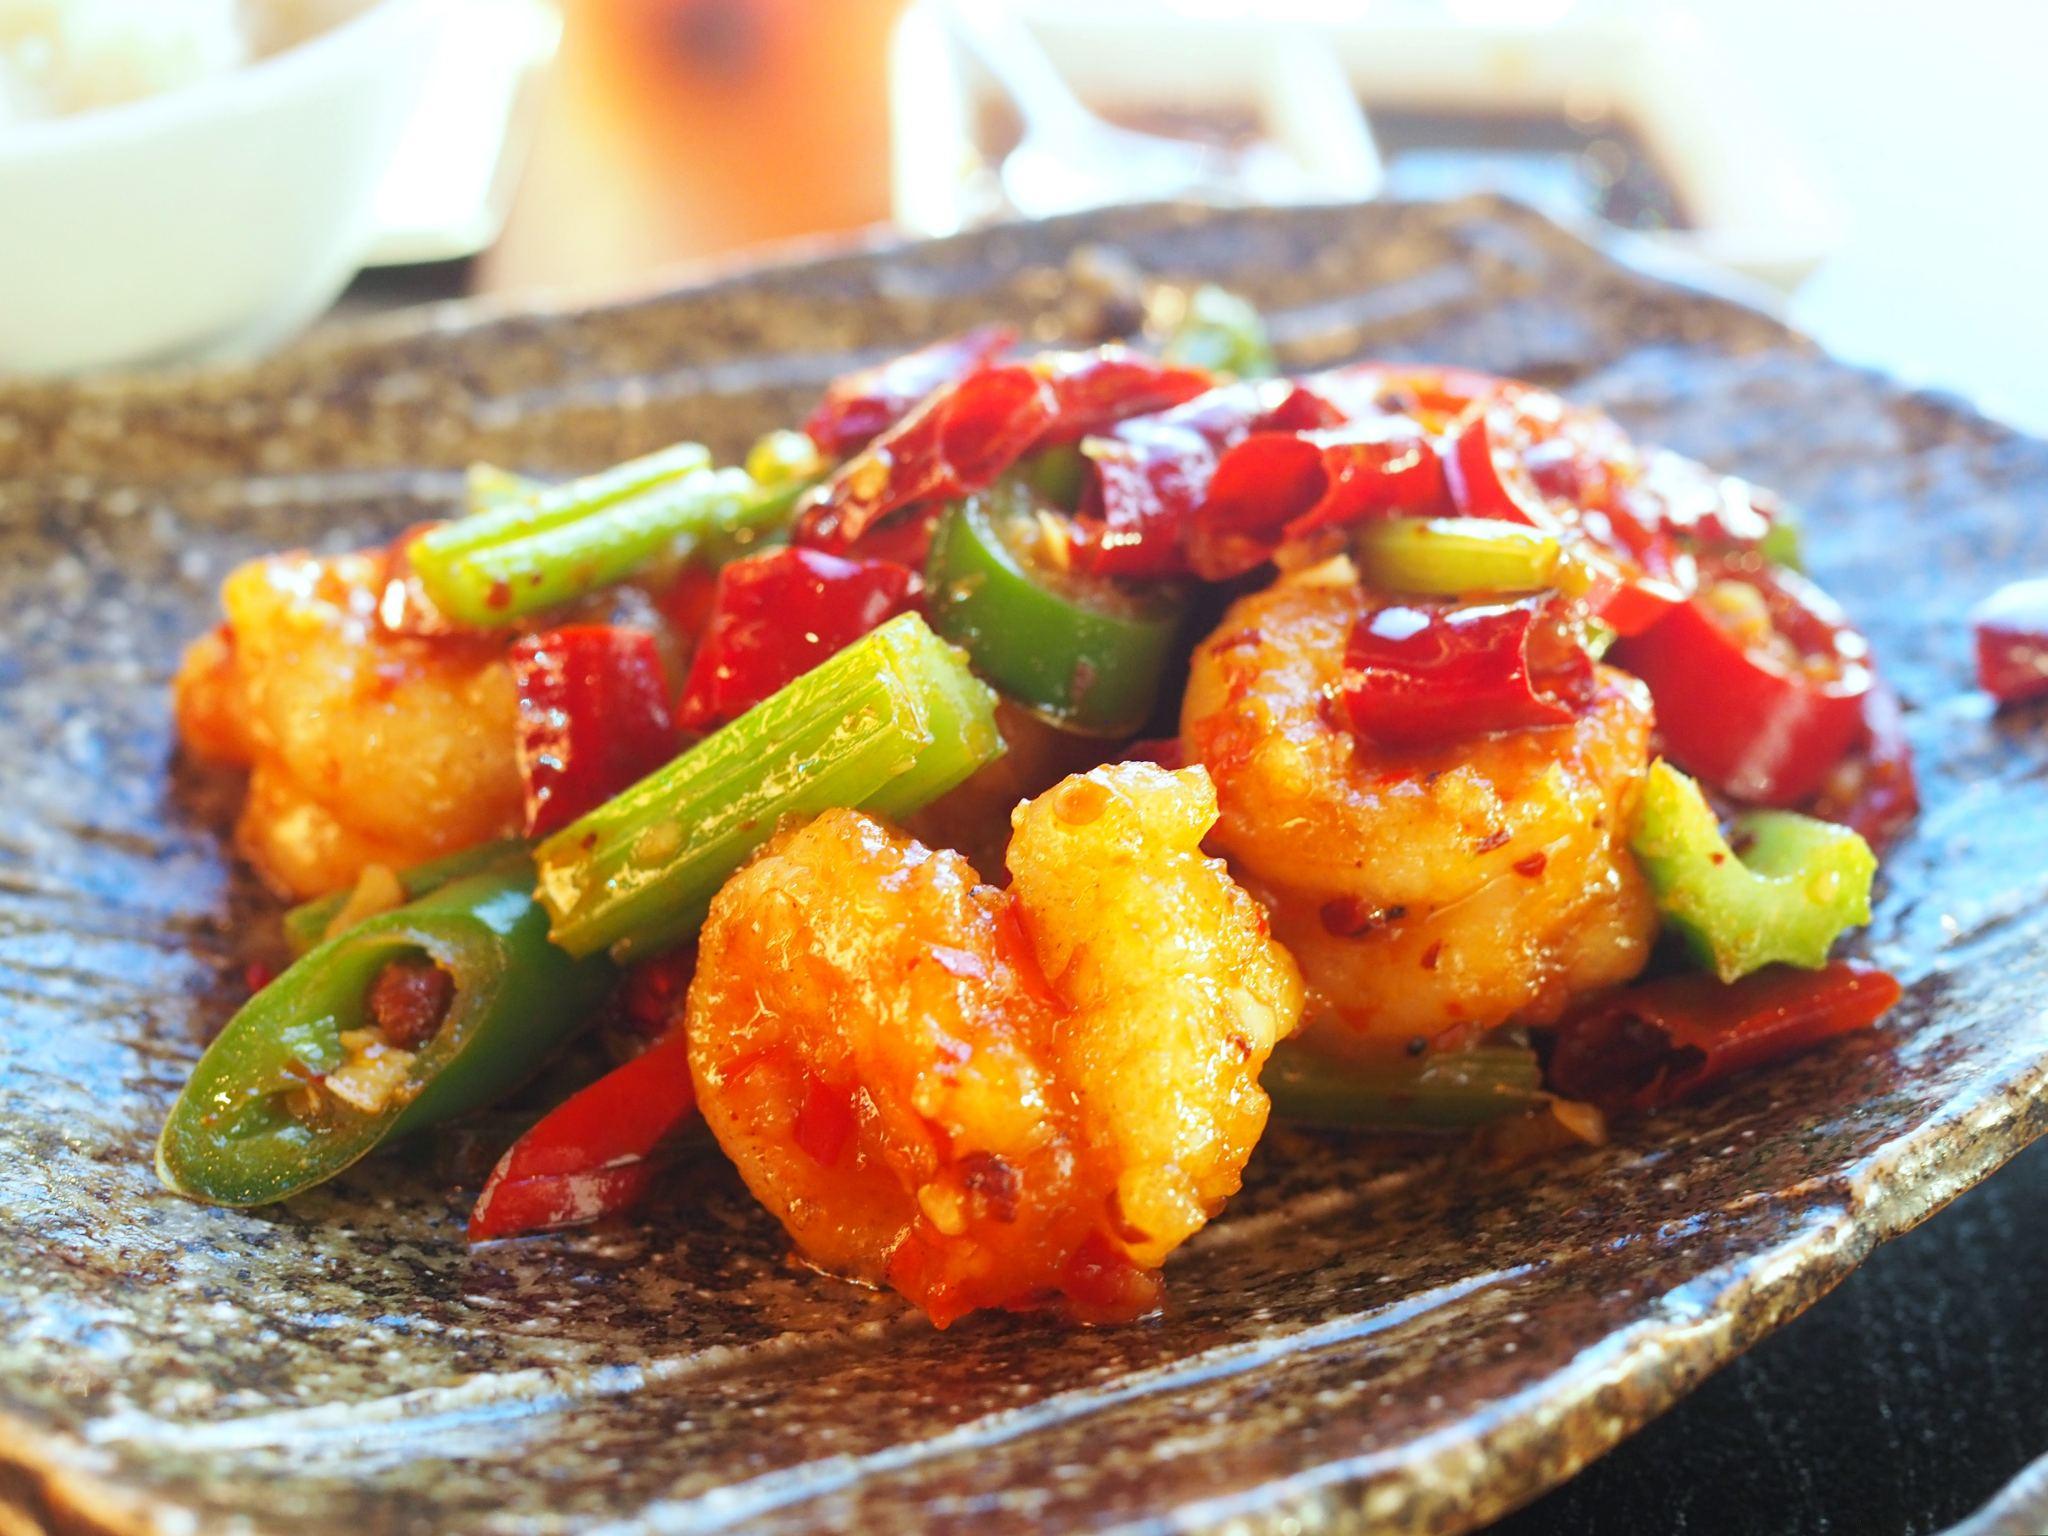 Hutong: Fifth Birthday Tasting Menu